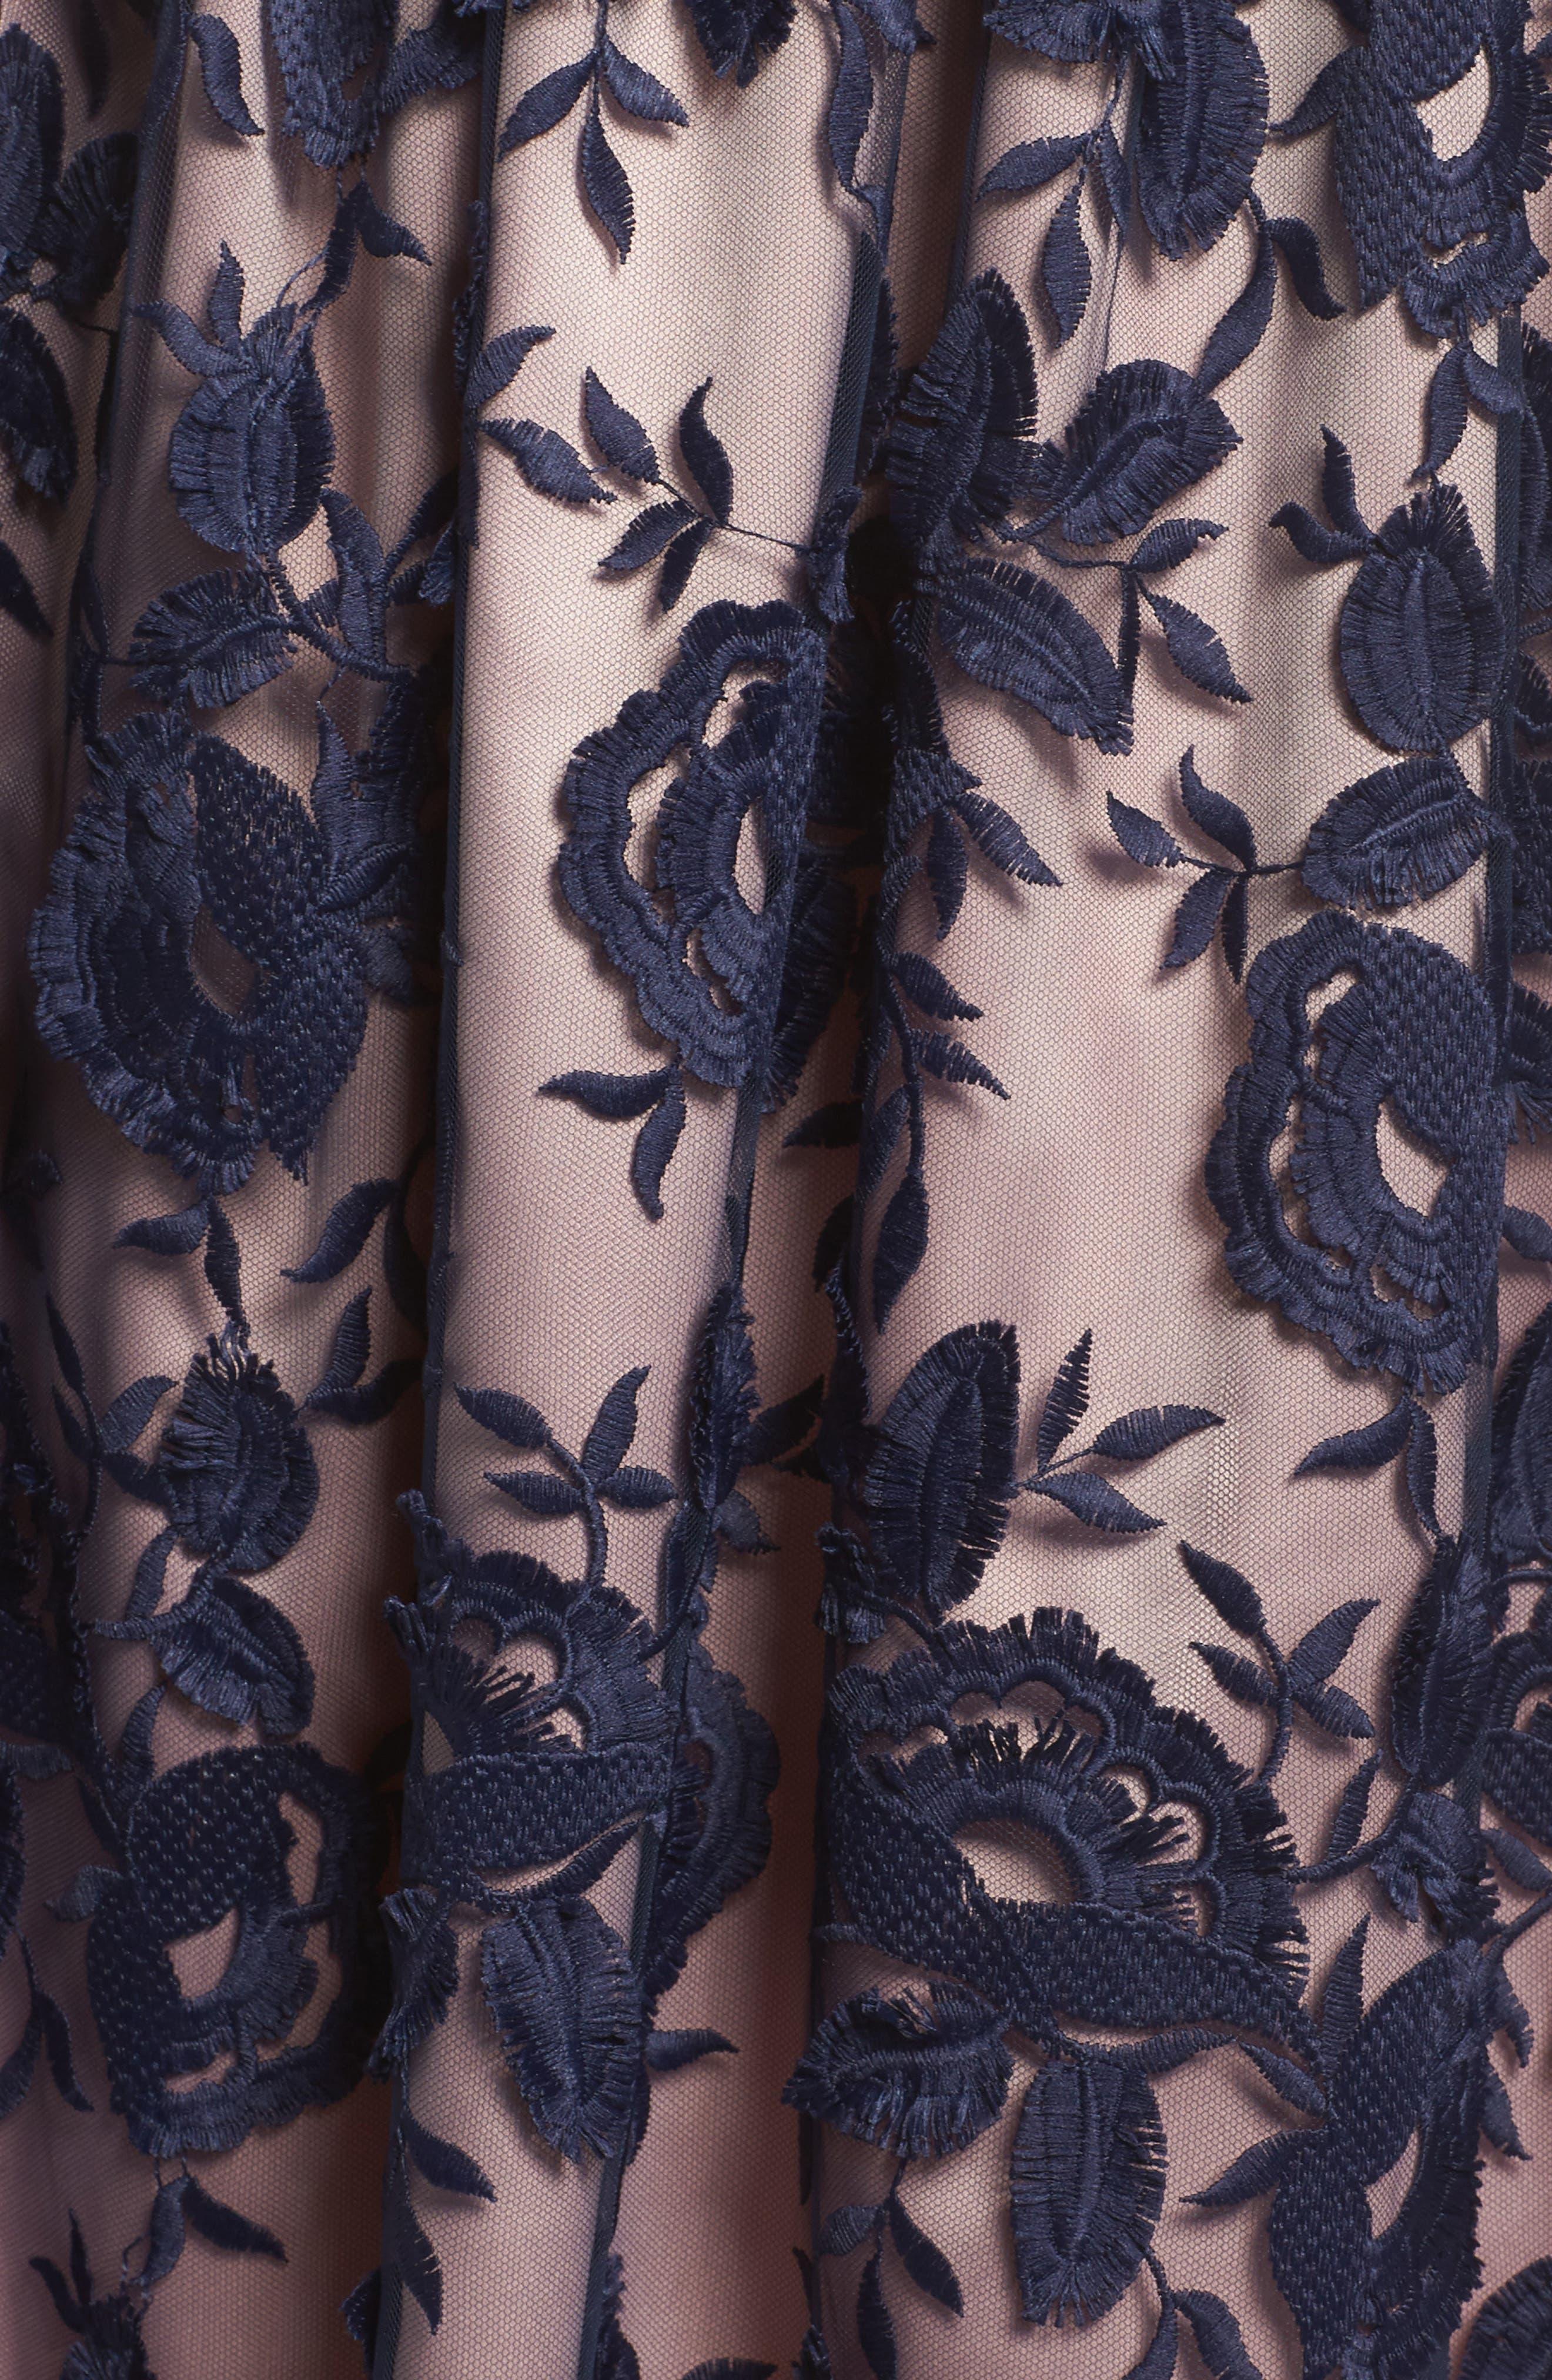 Embroidered Midi Skirt,                             Alternate thumbnail 4, color,                             401